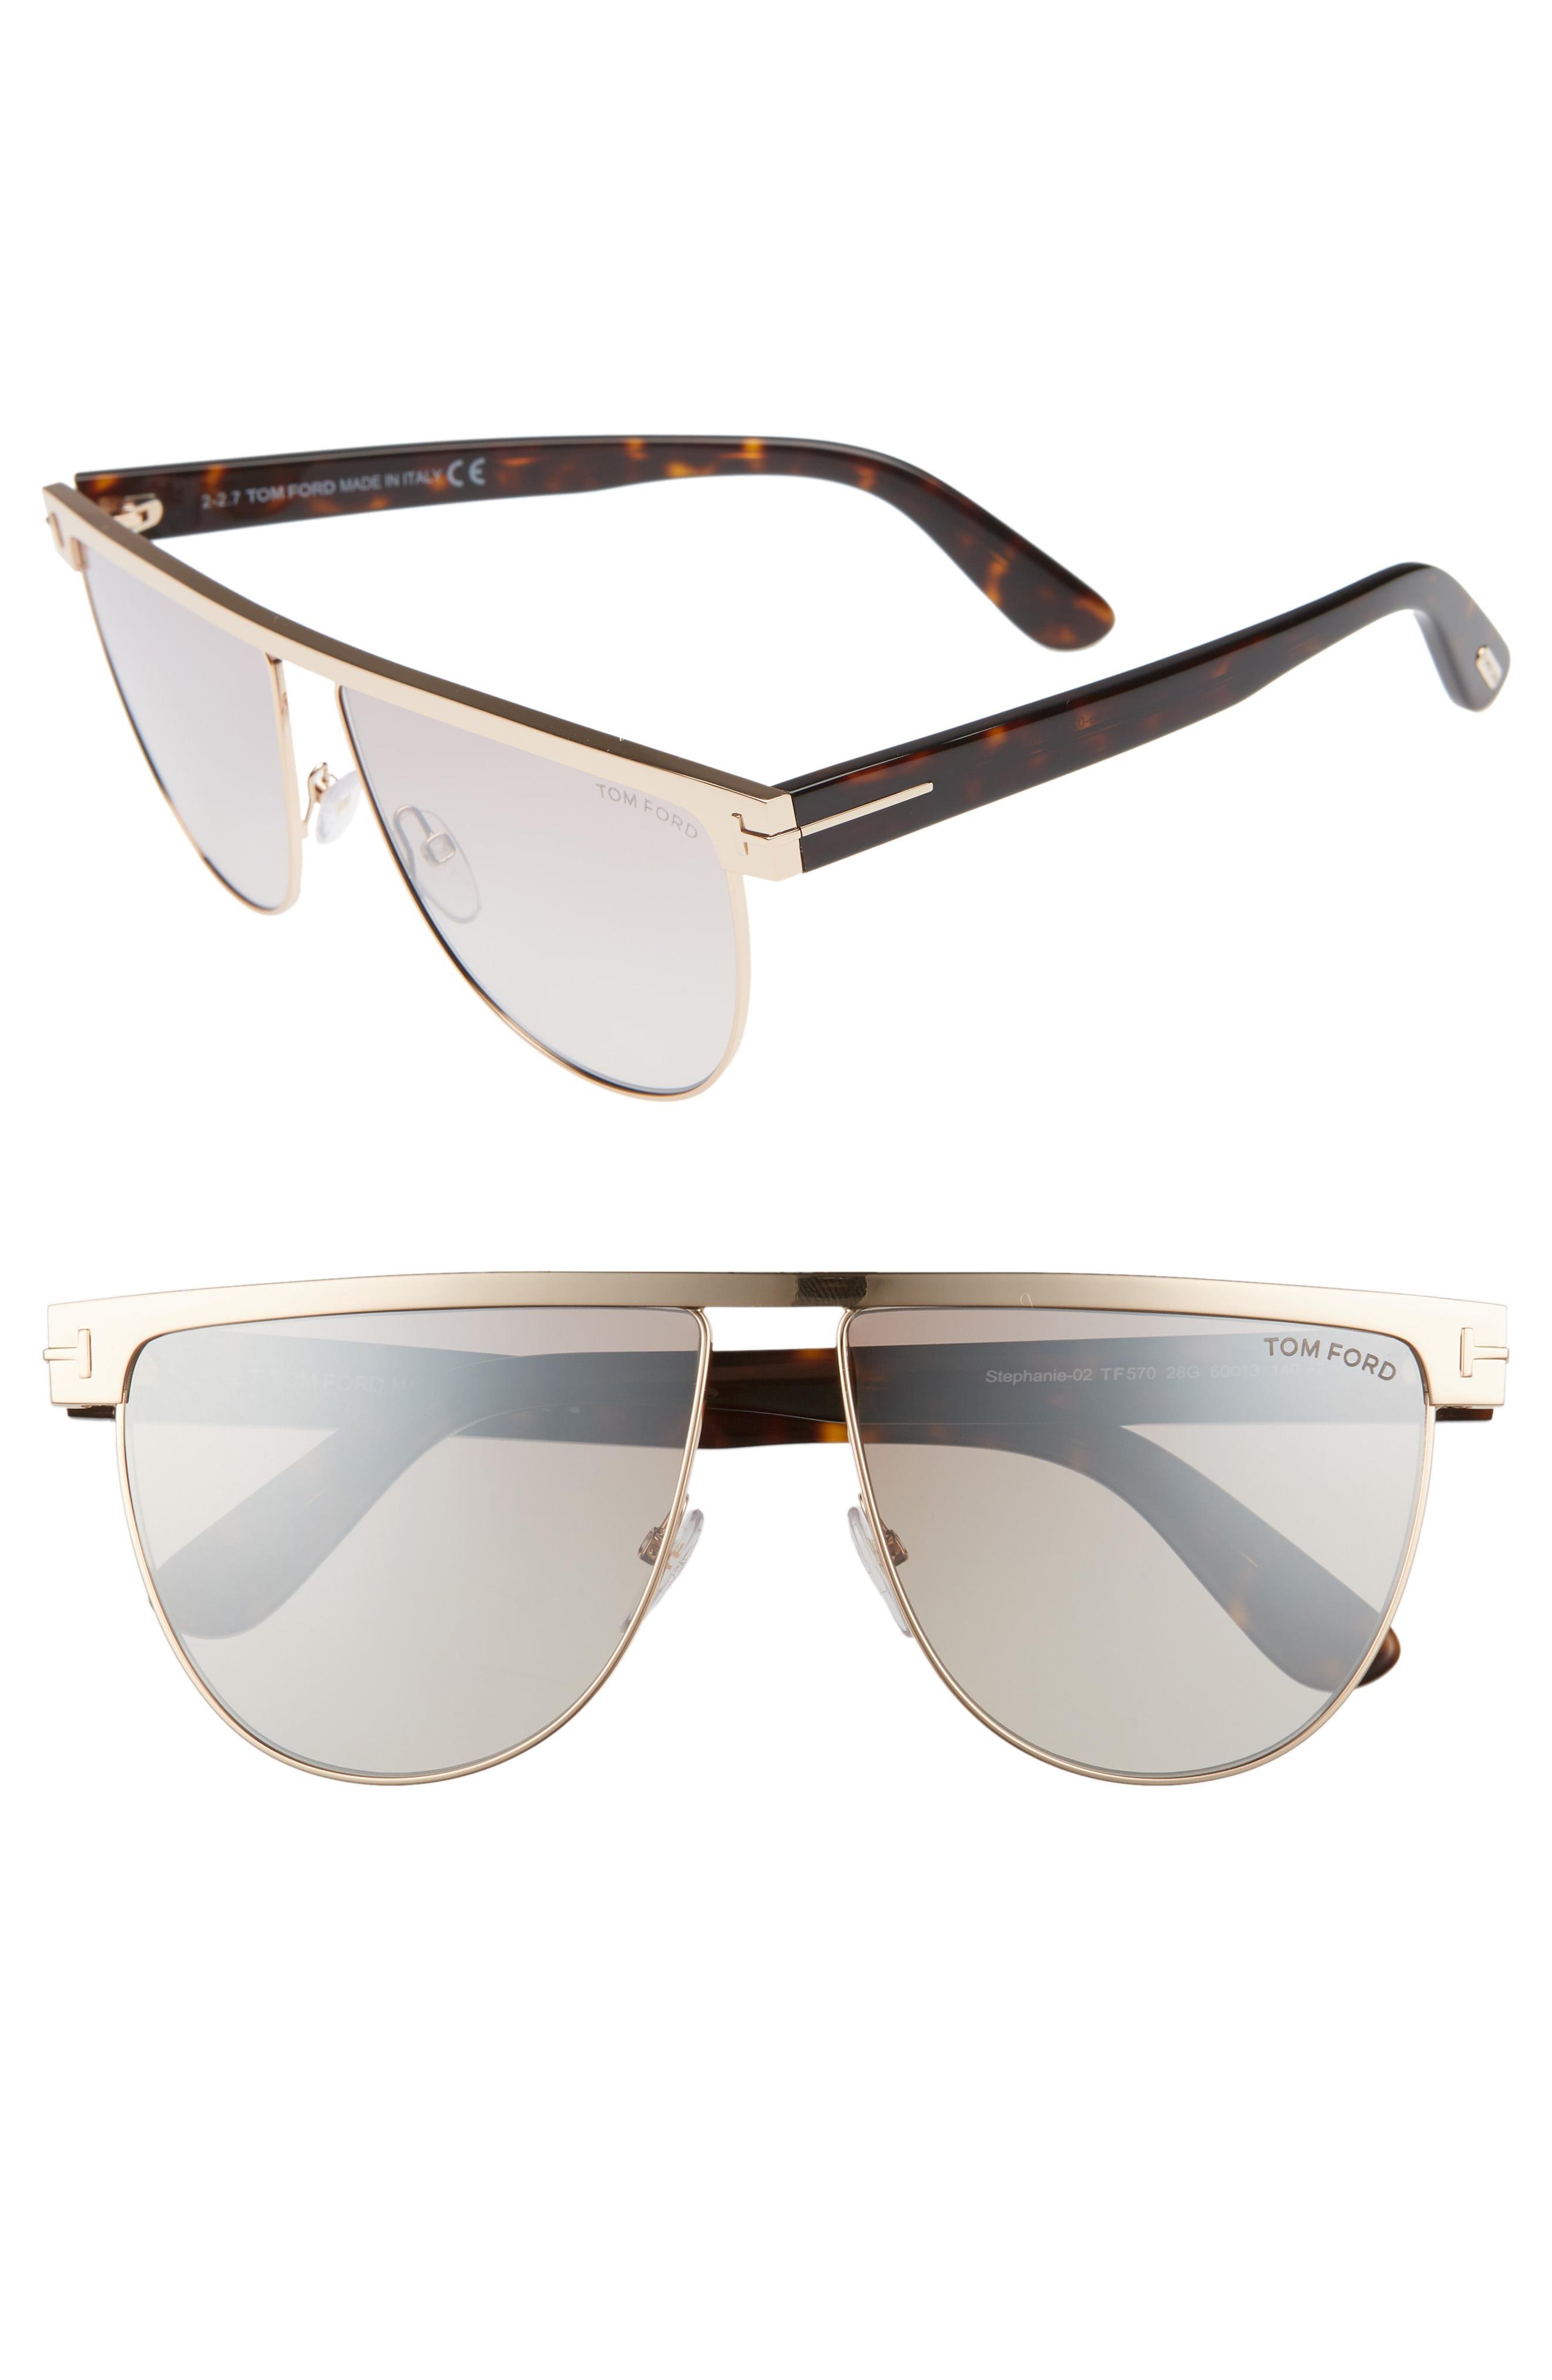 829bd426af1e Lyst - Tom Ford Stephanie 60mm Mirrored Sunglasses in Metallic